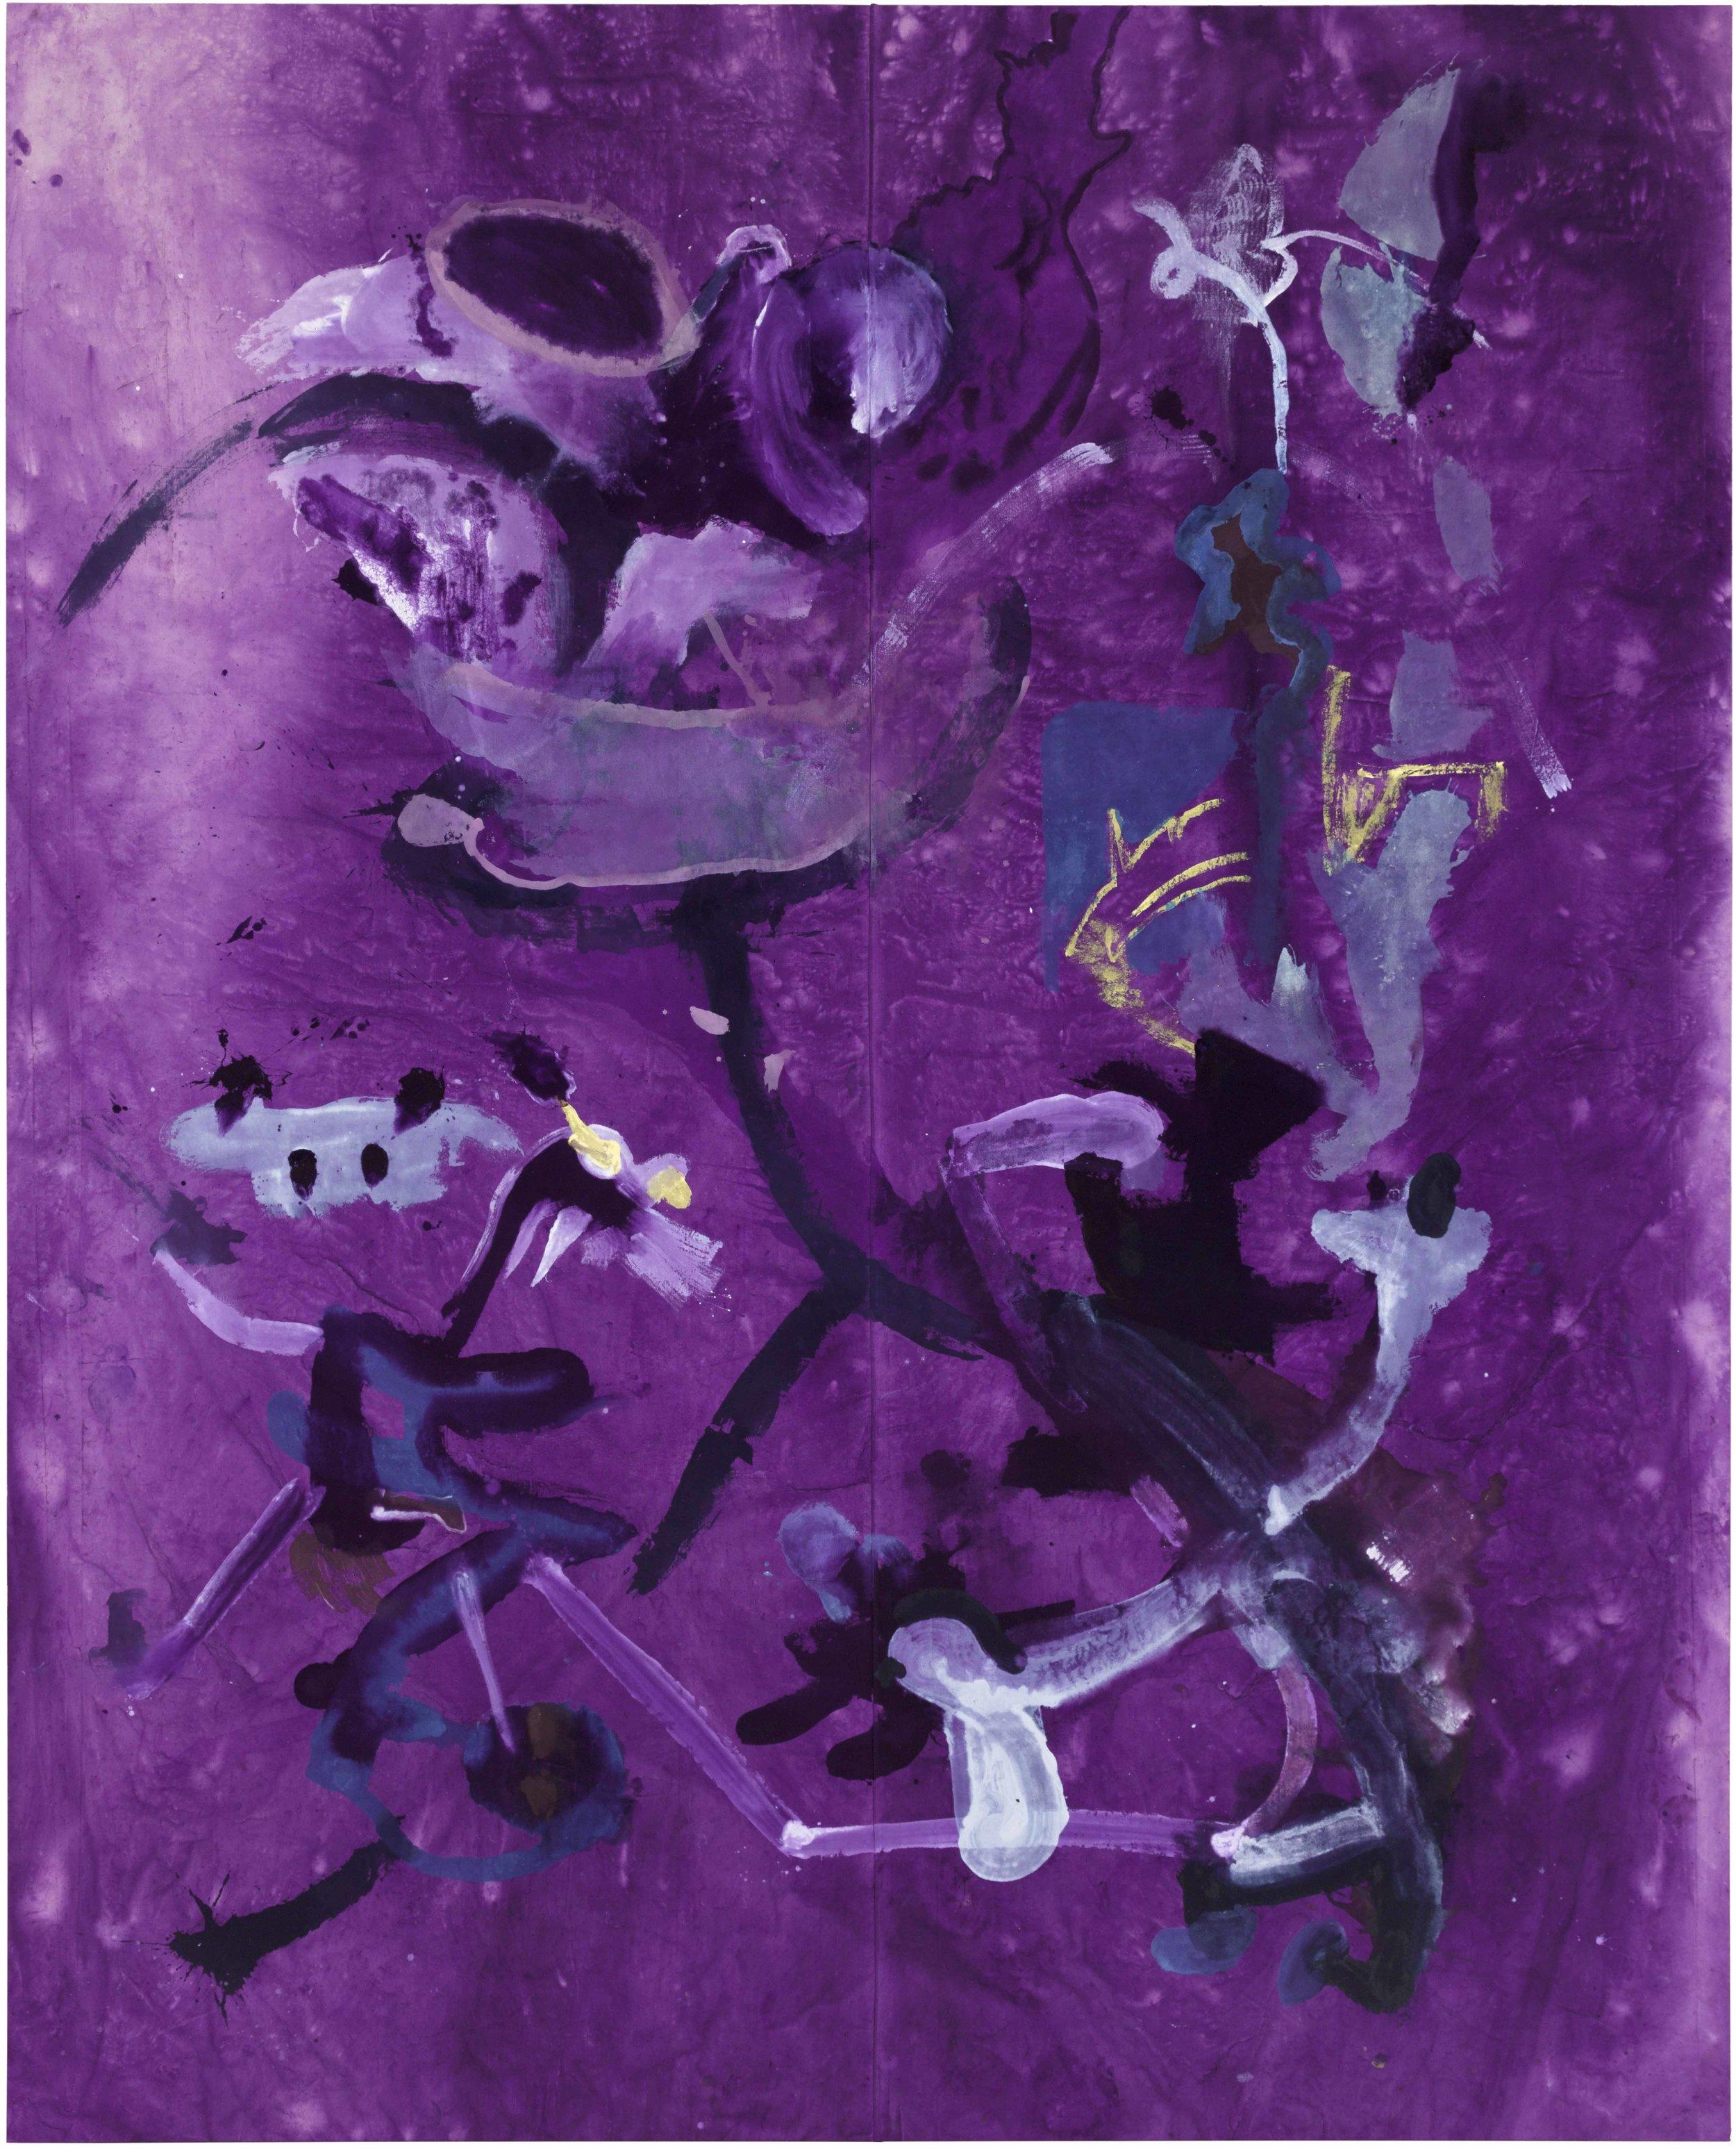 Drew Beattie and Ben Shepard  Night Garden  2015 acrylic on canvas 166 x 134 inches